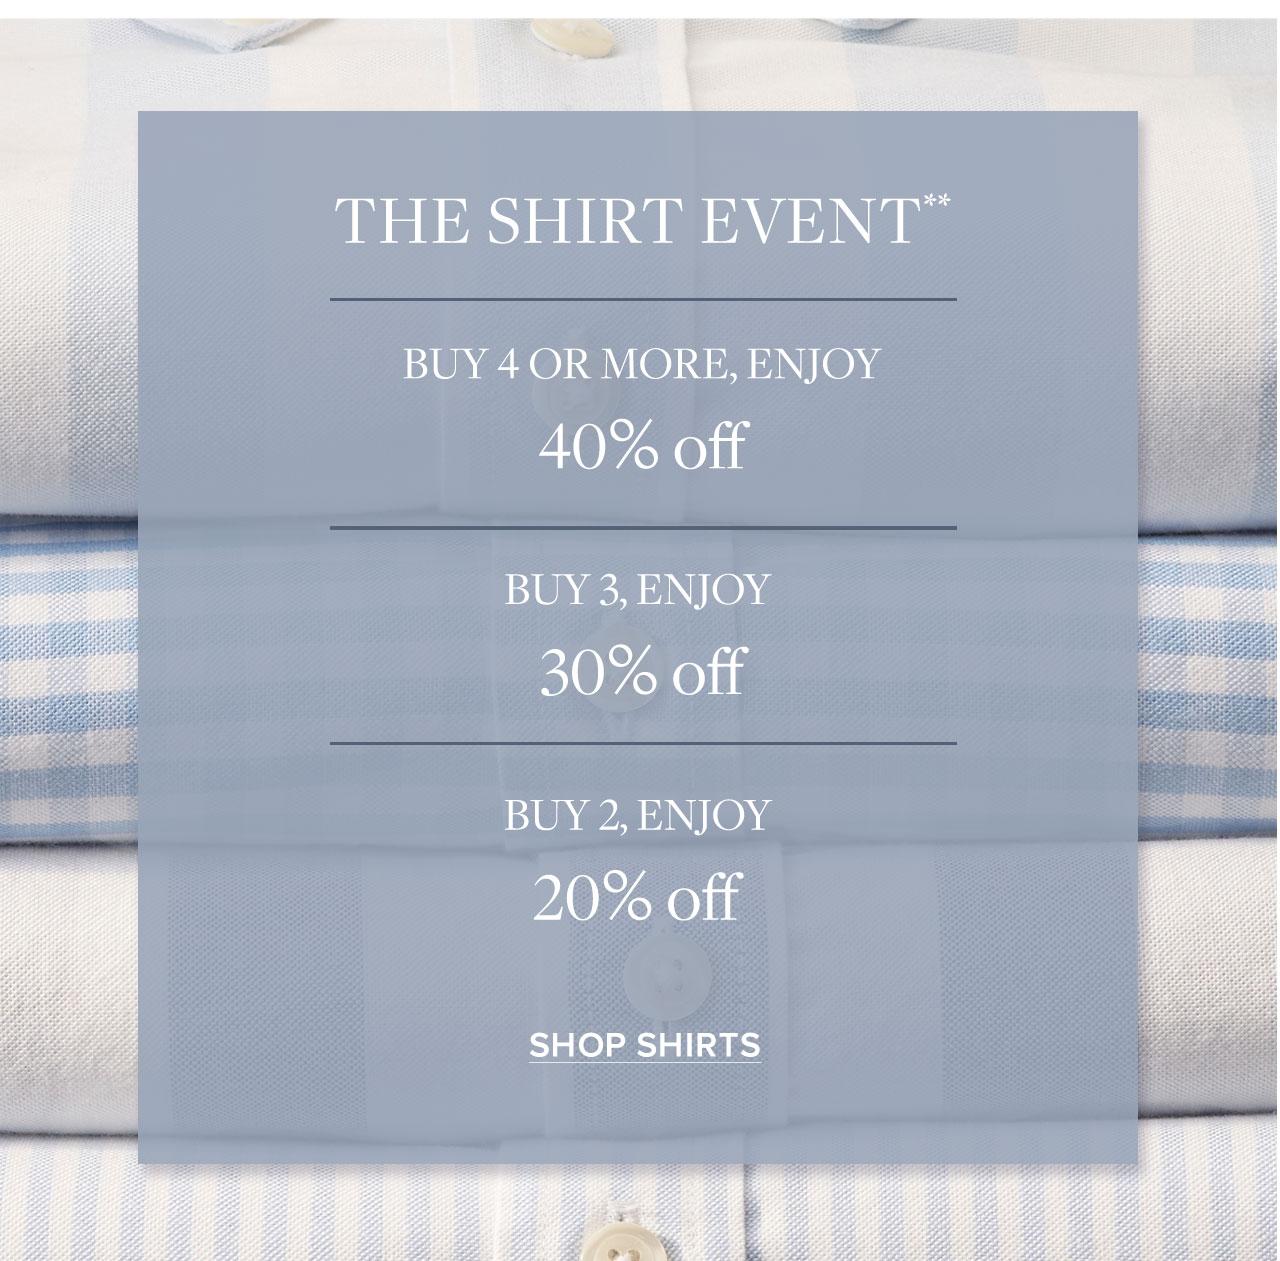 The Shirt Event. Buy 4 or more, enjoy 40% off. Buy 3, enjoy 30% off. But 2, enjoy 20% off. Shop Shirts